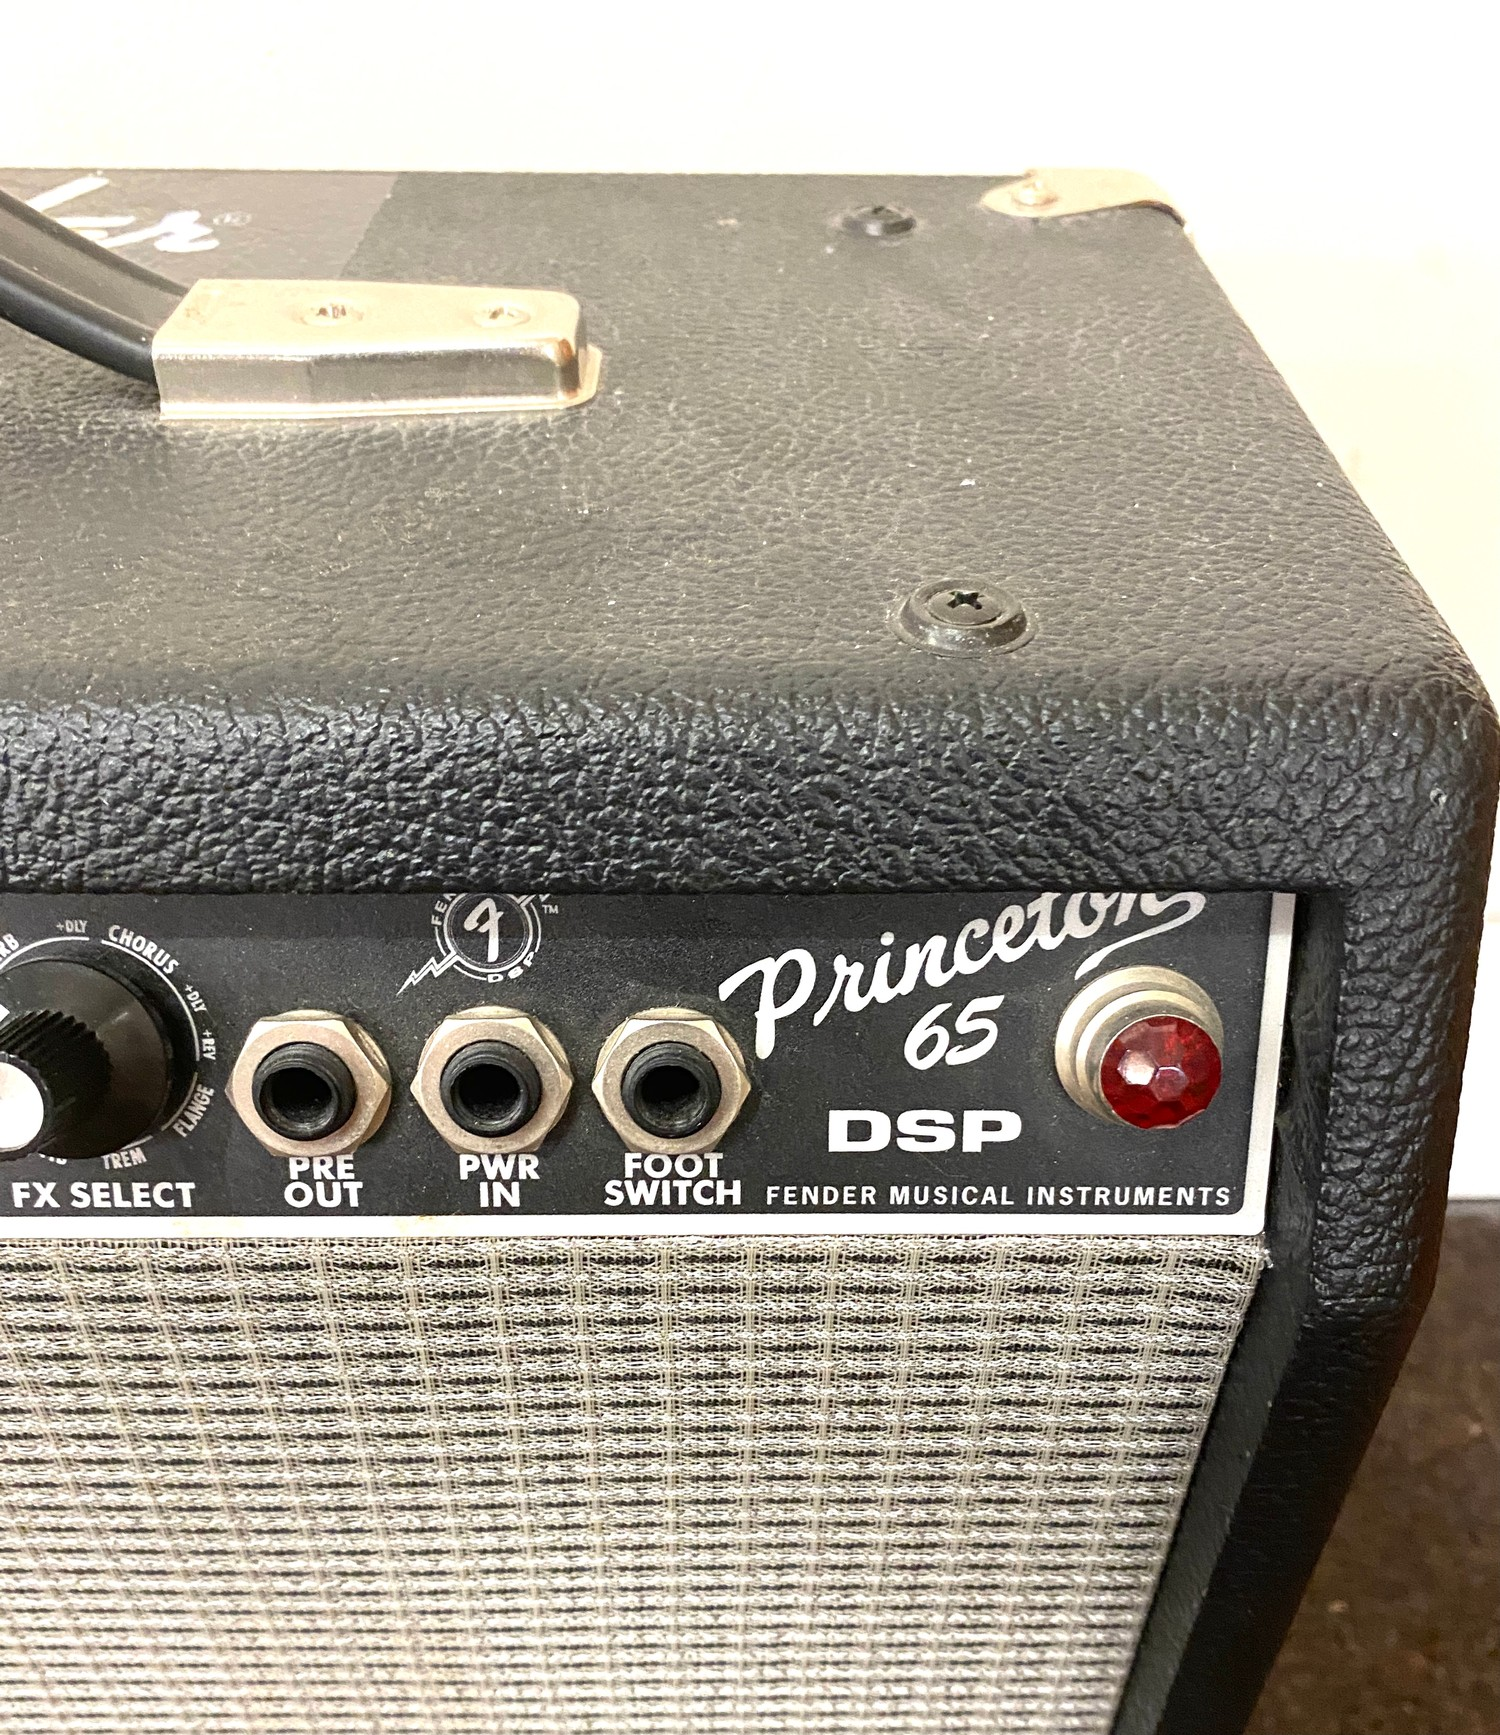 Fender Princeton 65 amplifier - Image 2 of 2